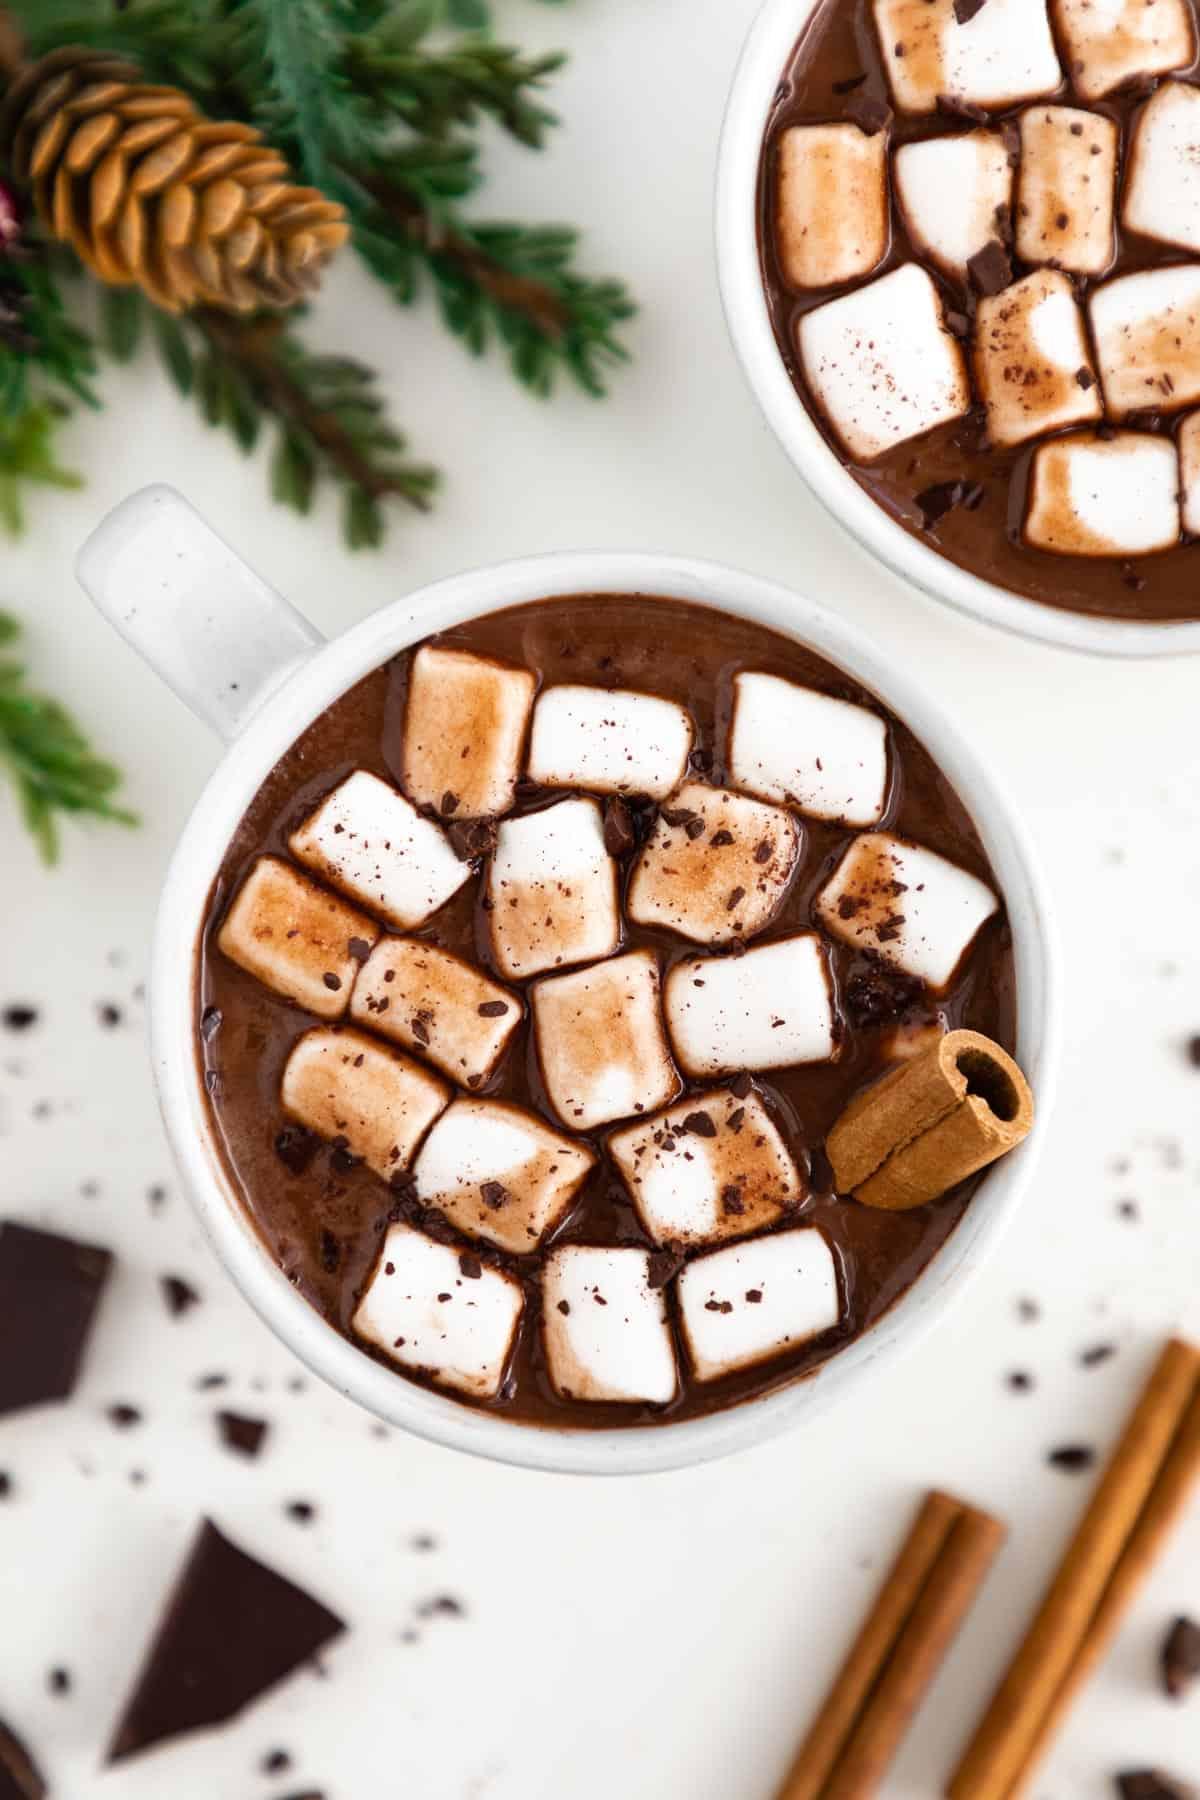 vegan hot chocolate inside a white ceramic mug topped with mini marshmallows and a cinnamon stick